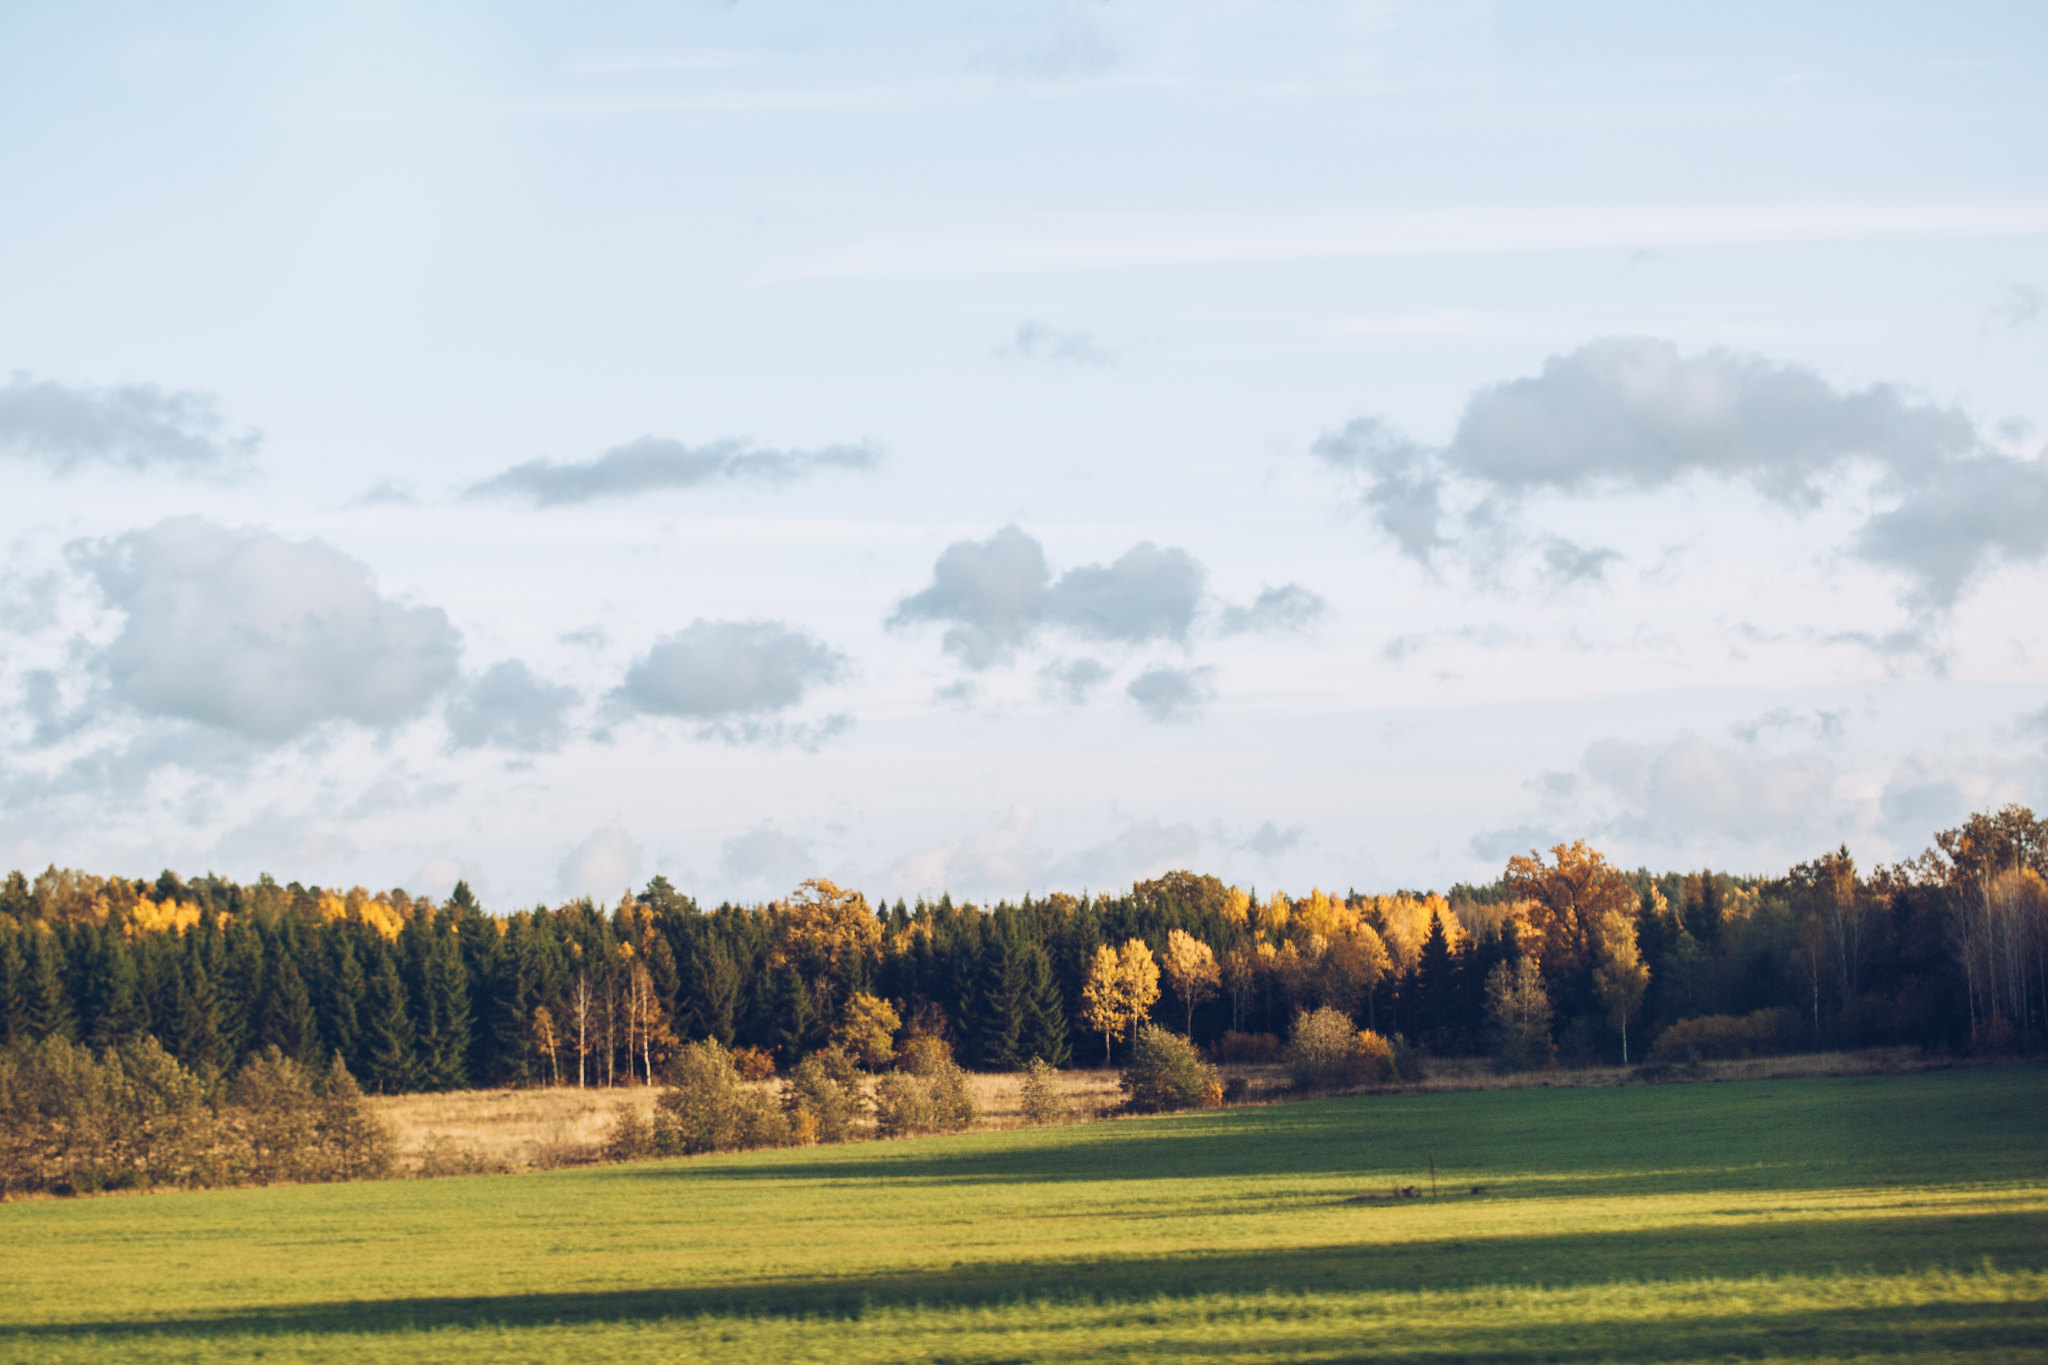 Oktoberhöst - reaktionista.se